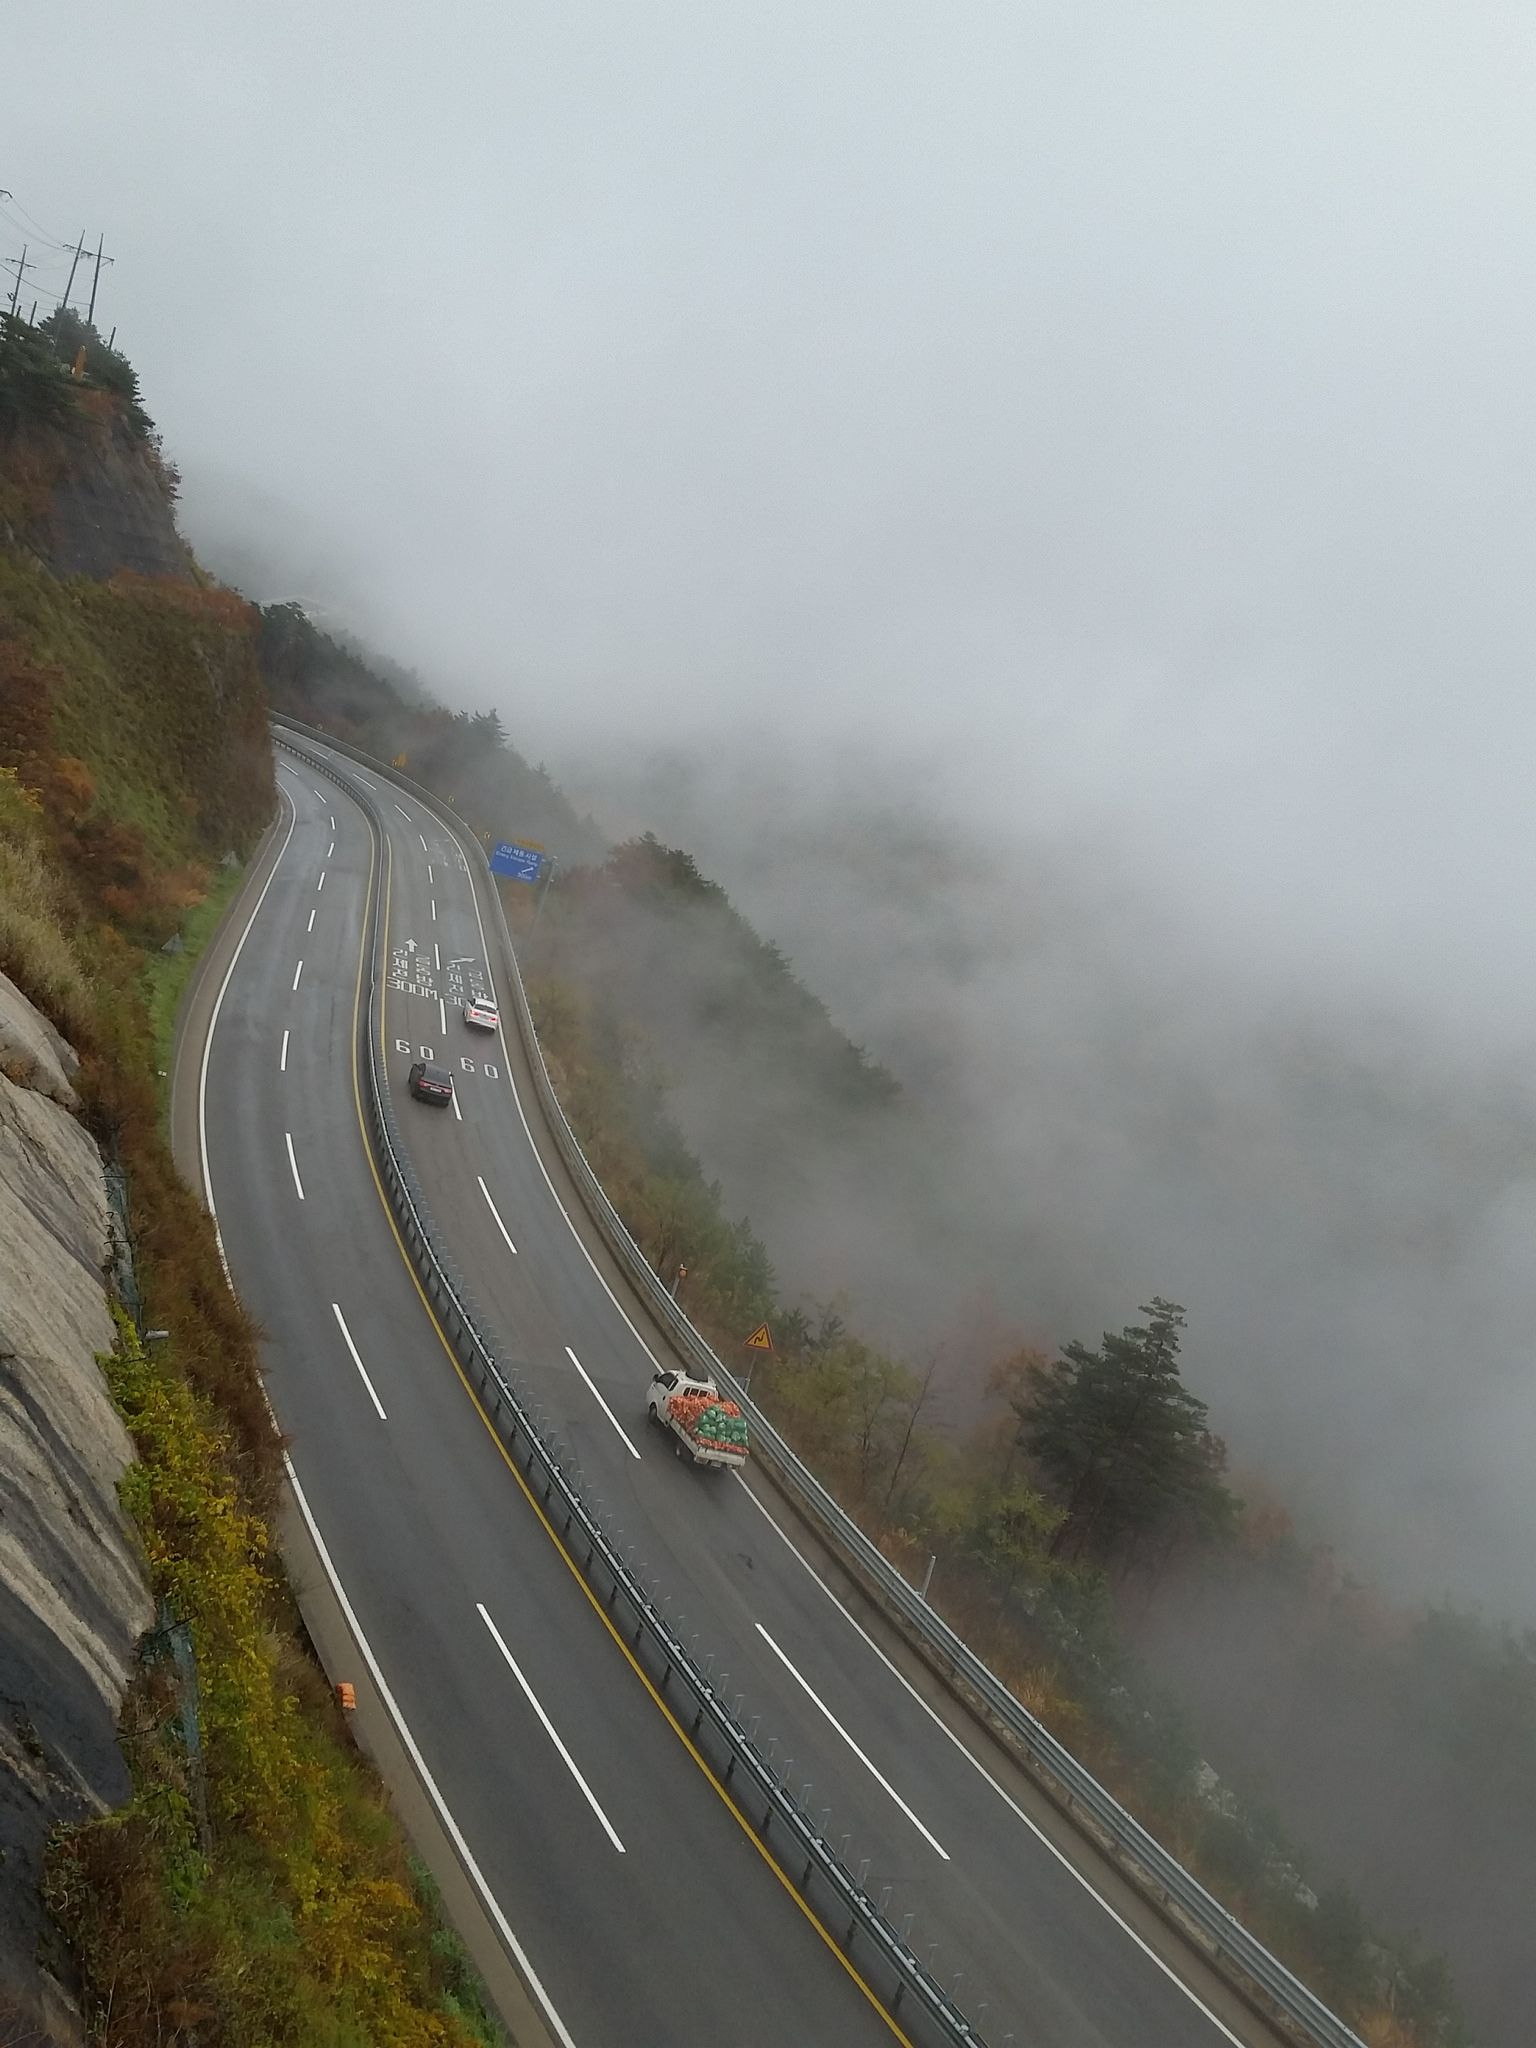 #Misiryeong Penetrating Road, #Gangwon Province Korea | 미시령동서관통도로 | https://flic.kr/p/AWtFq9